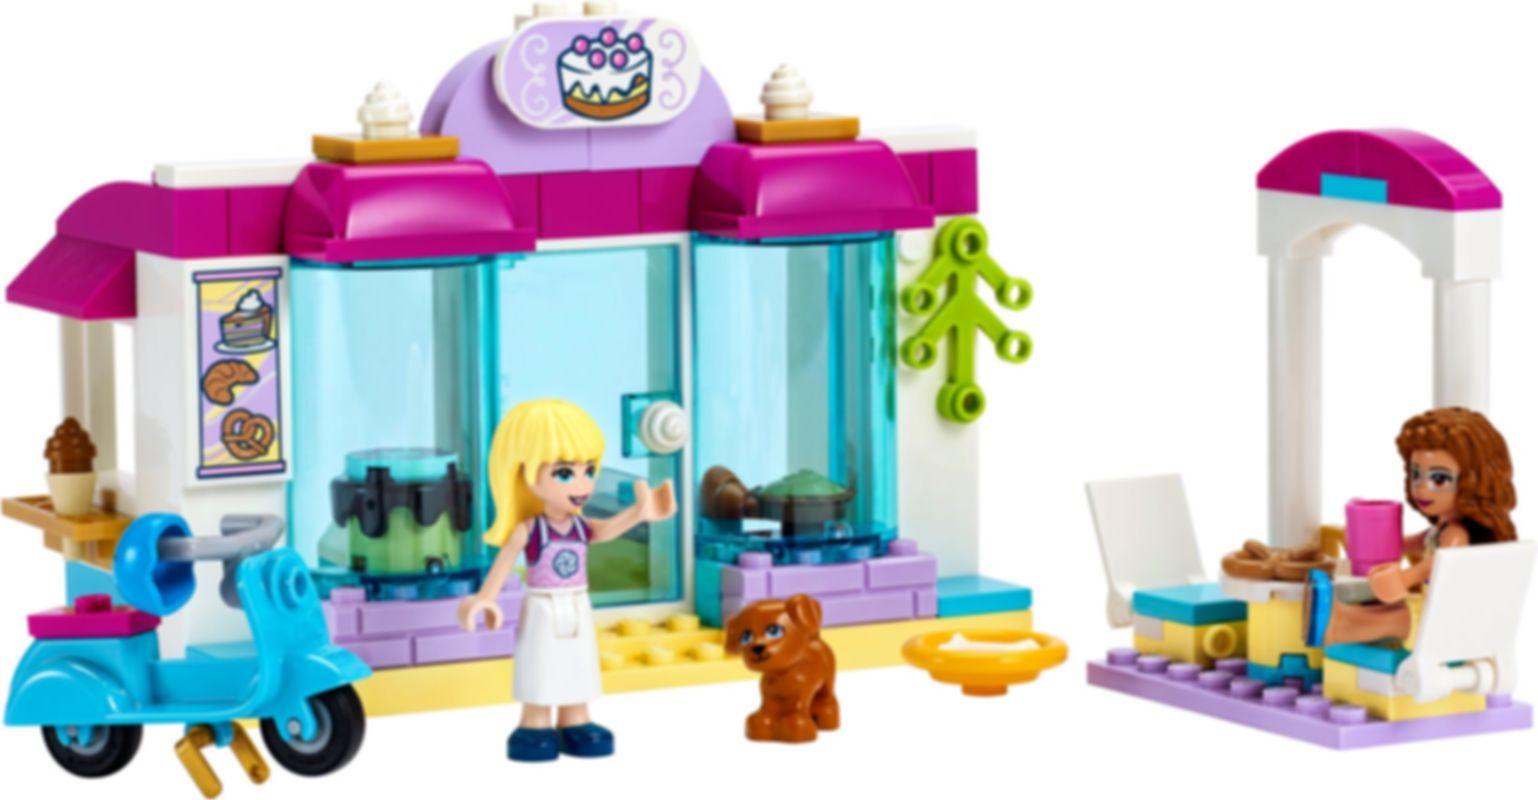 LEGO® Friends Heartlake City Bakery gameplay